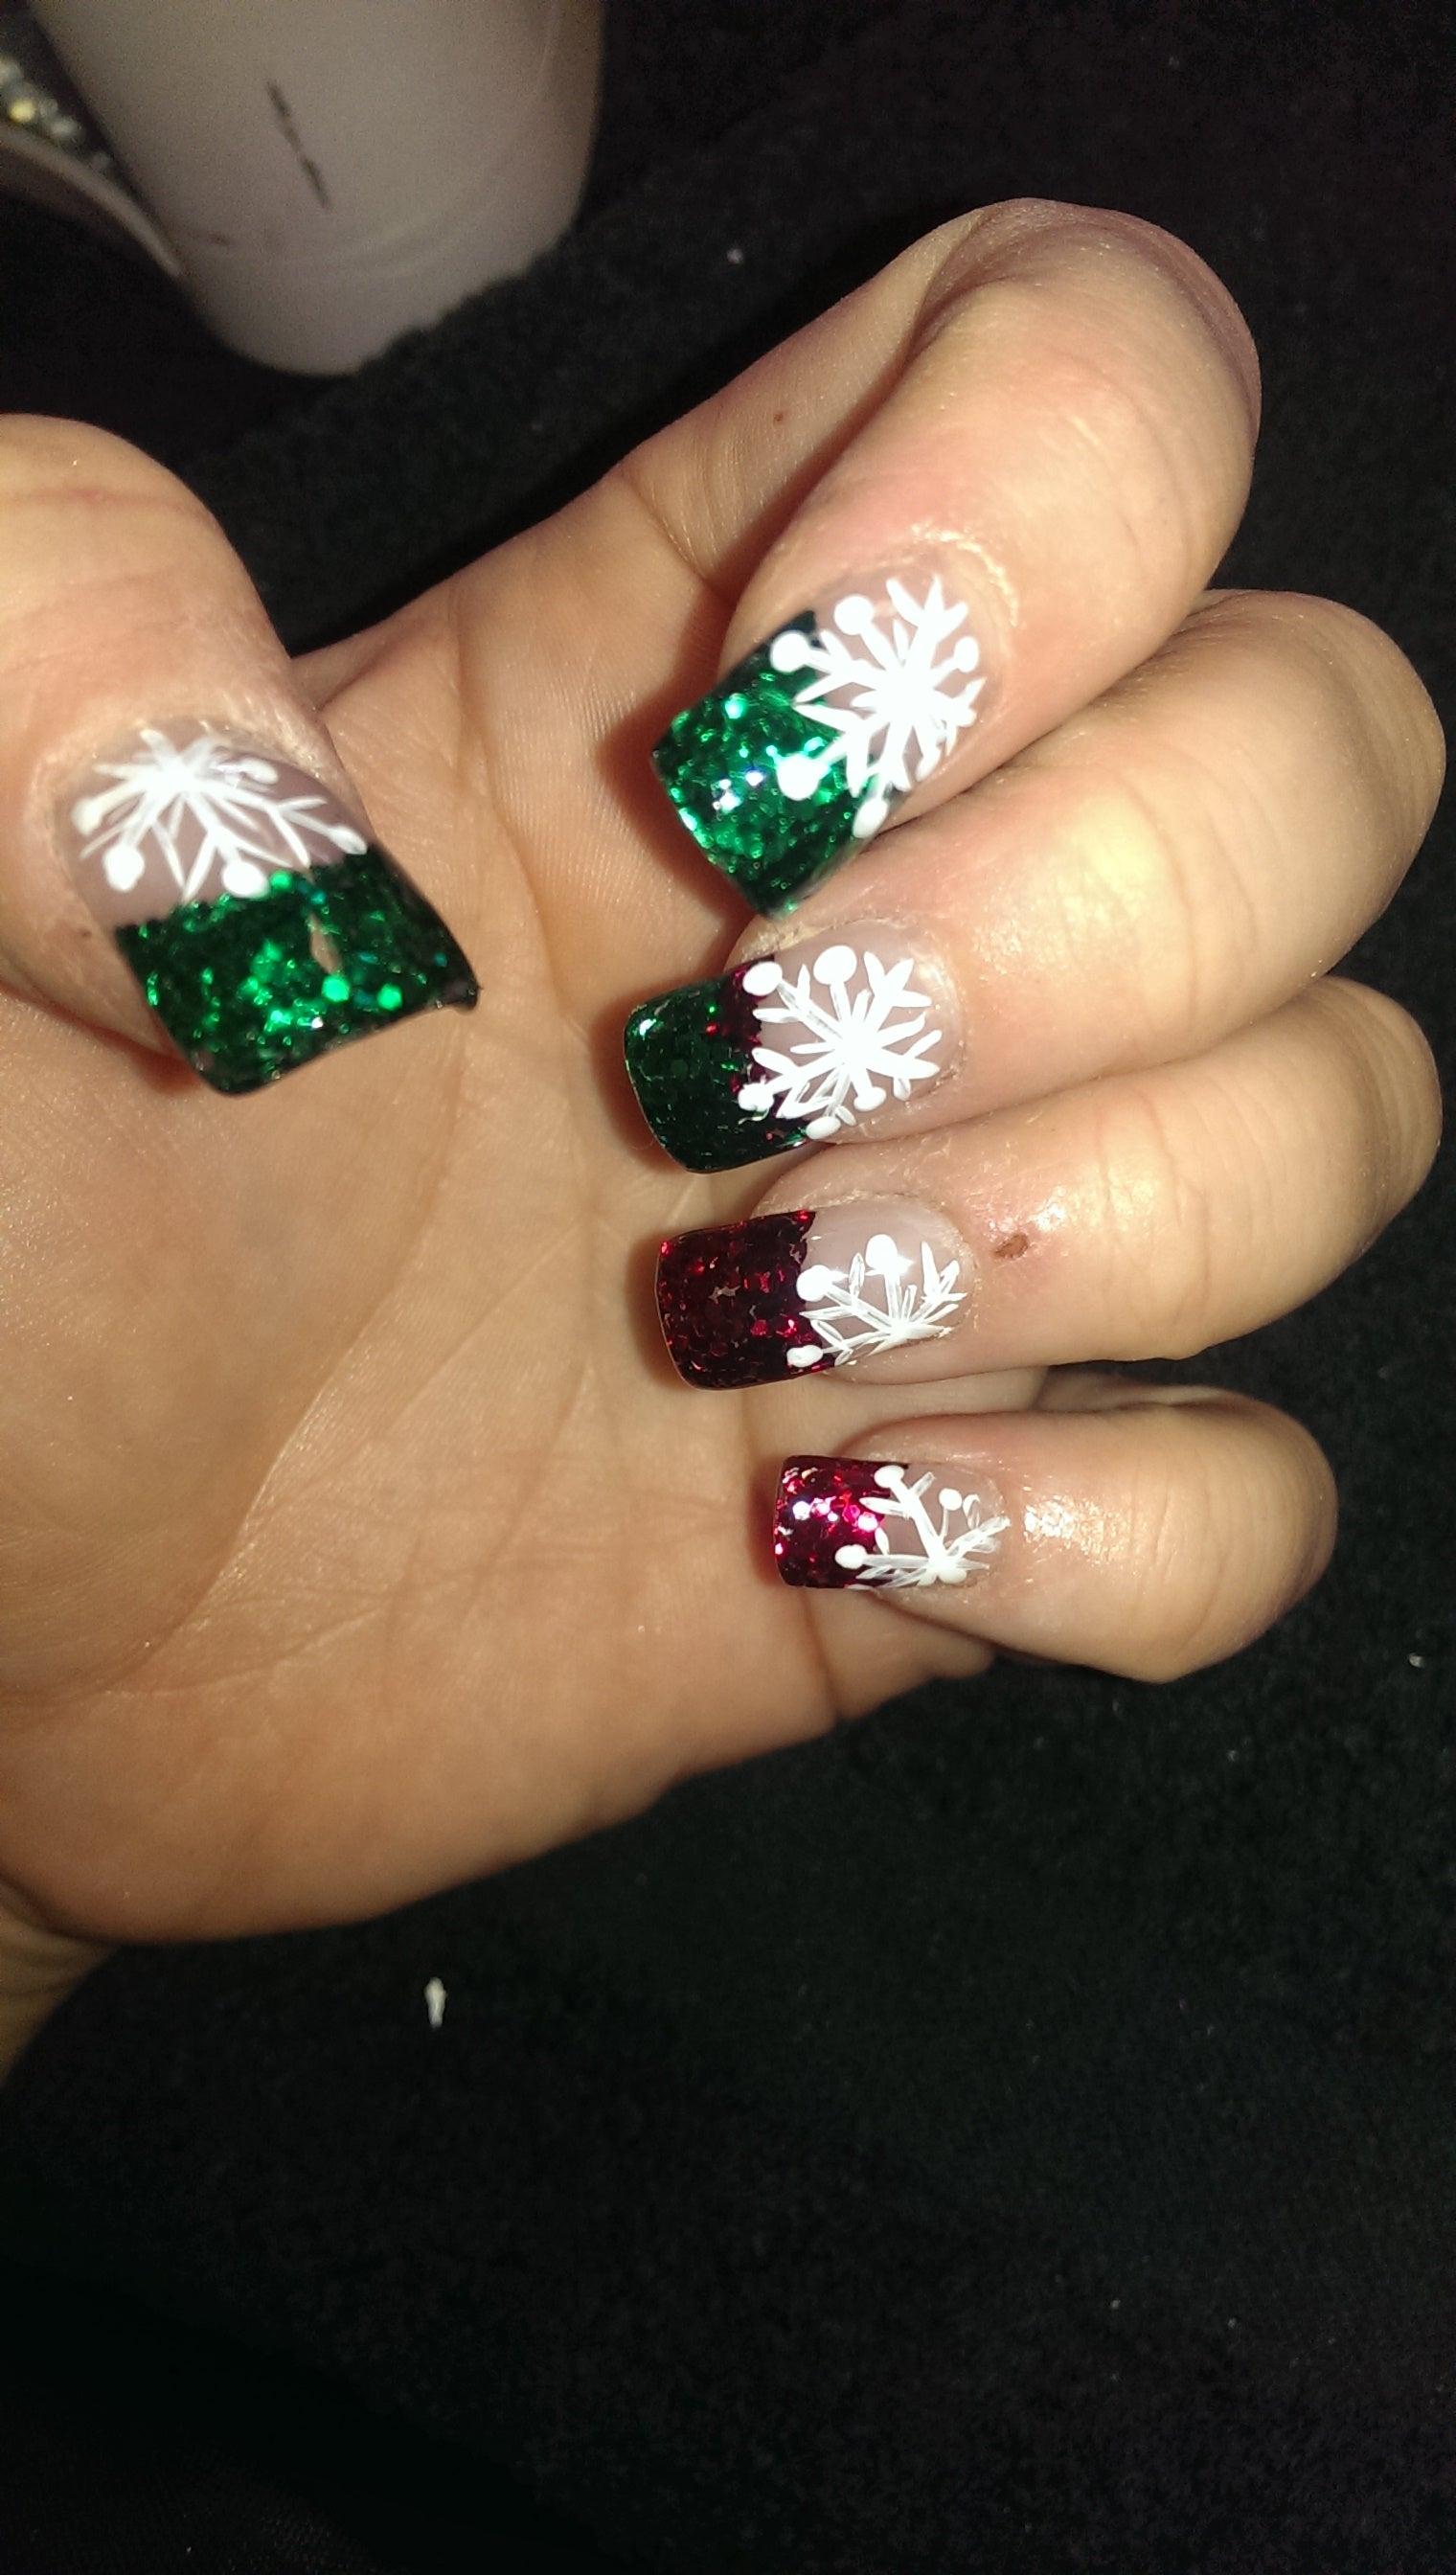 Easy Snowflake Nail Art: 5 Steps